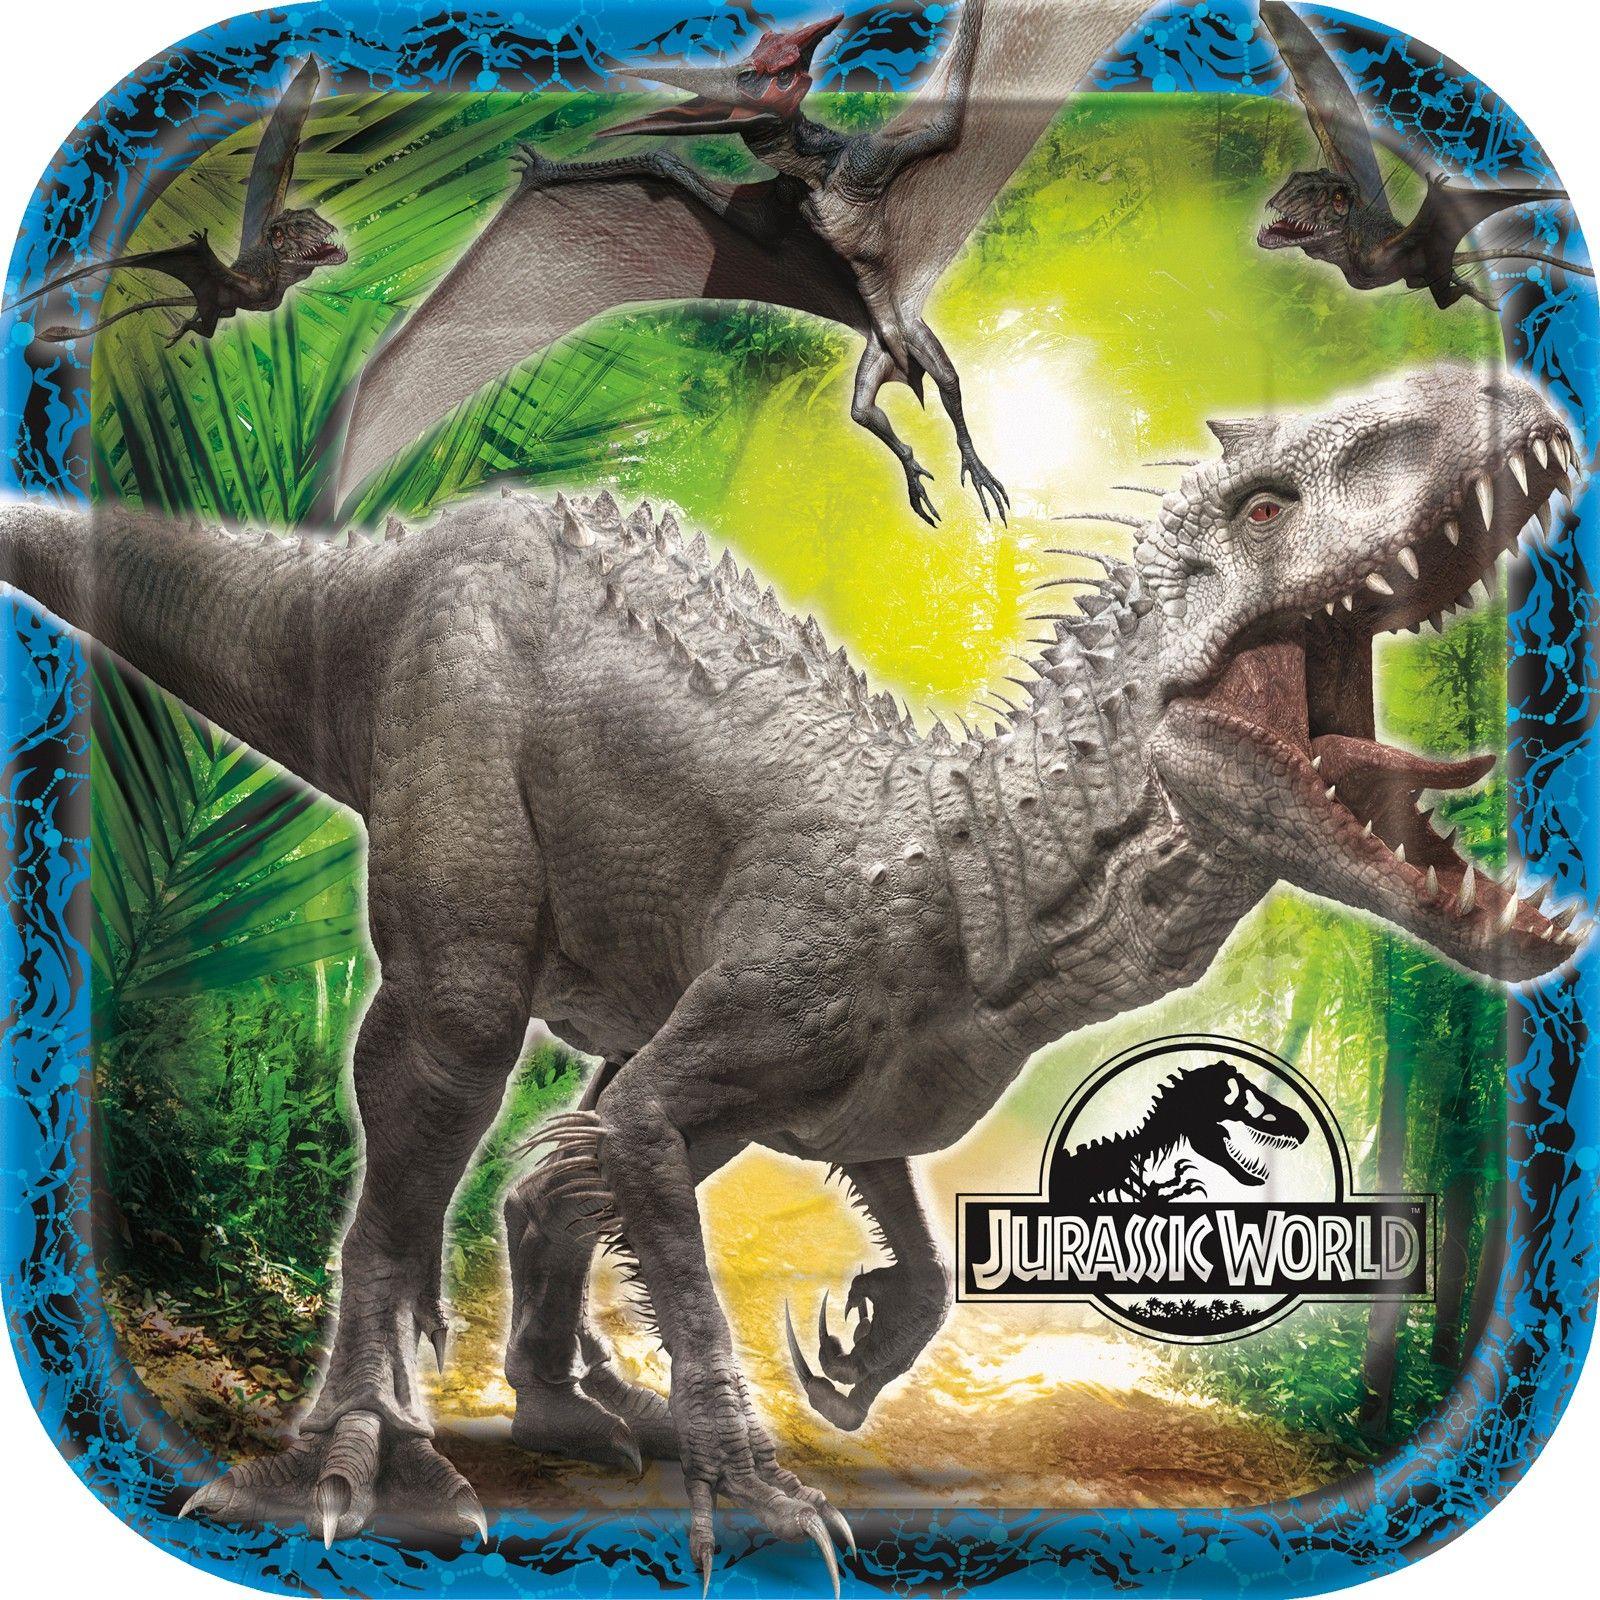 Jurassic World Square Dinner Plates